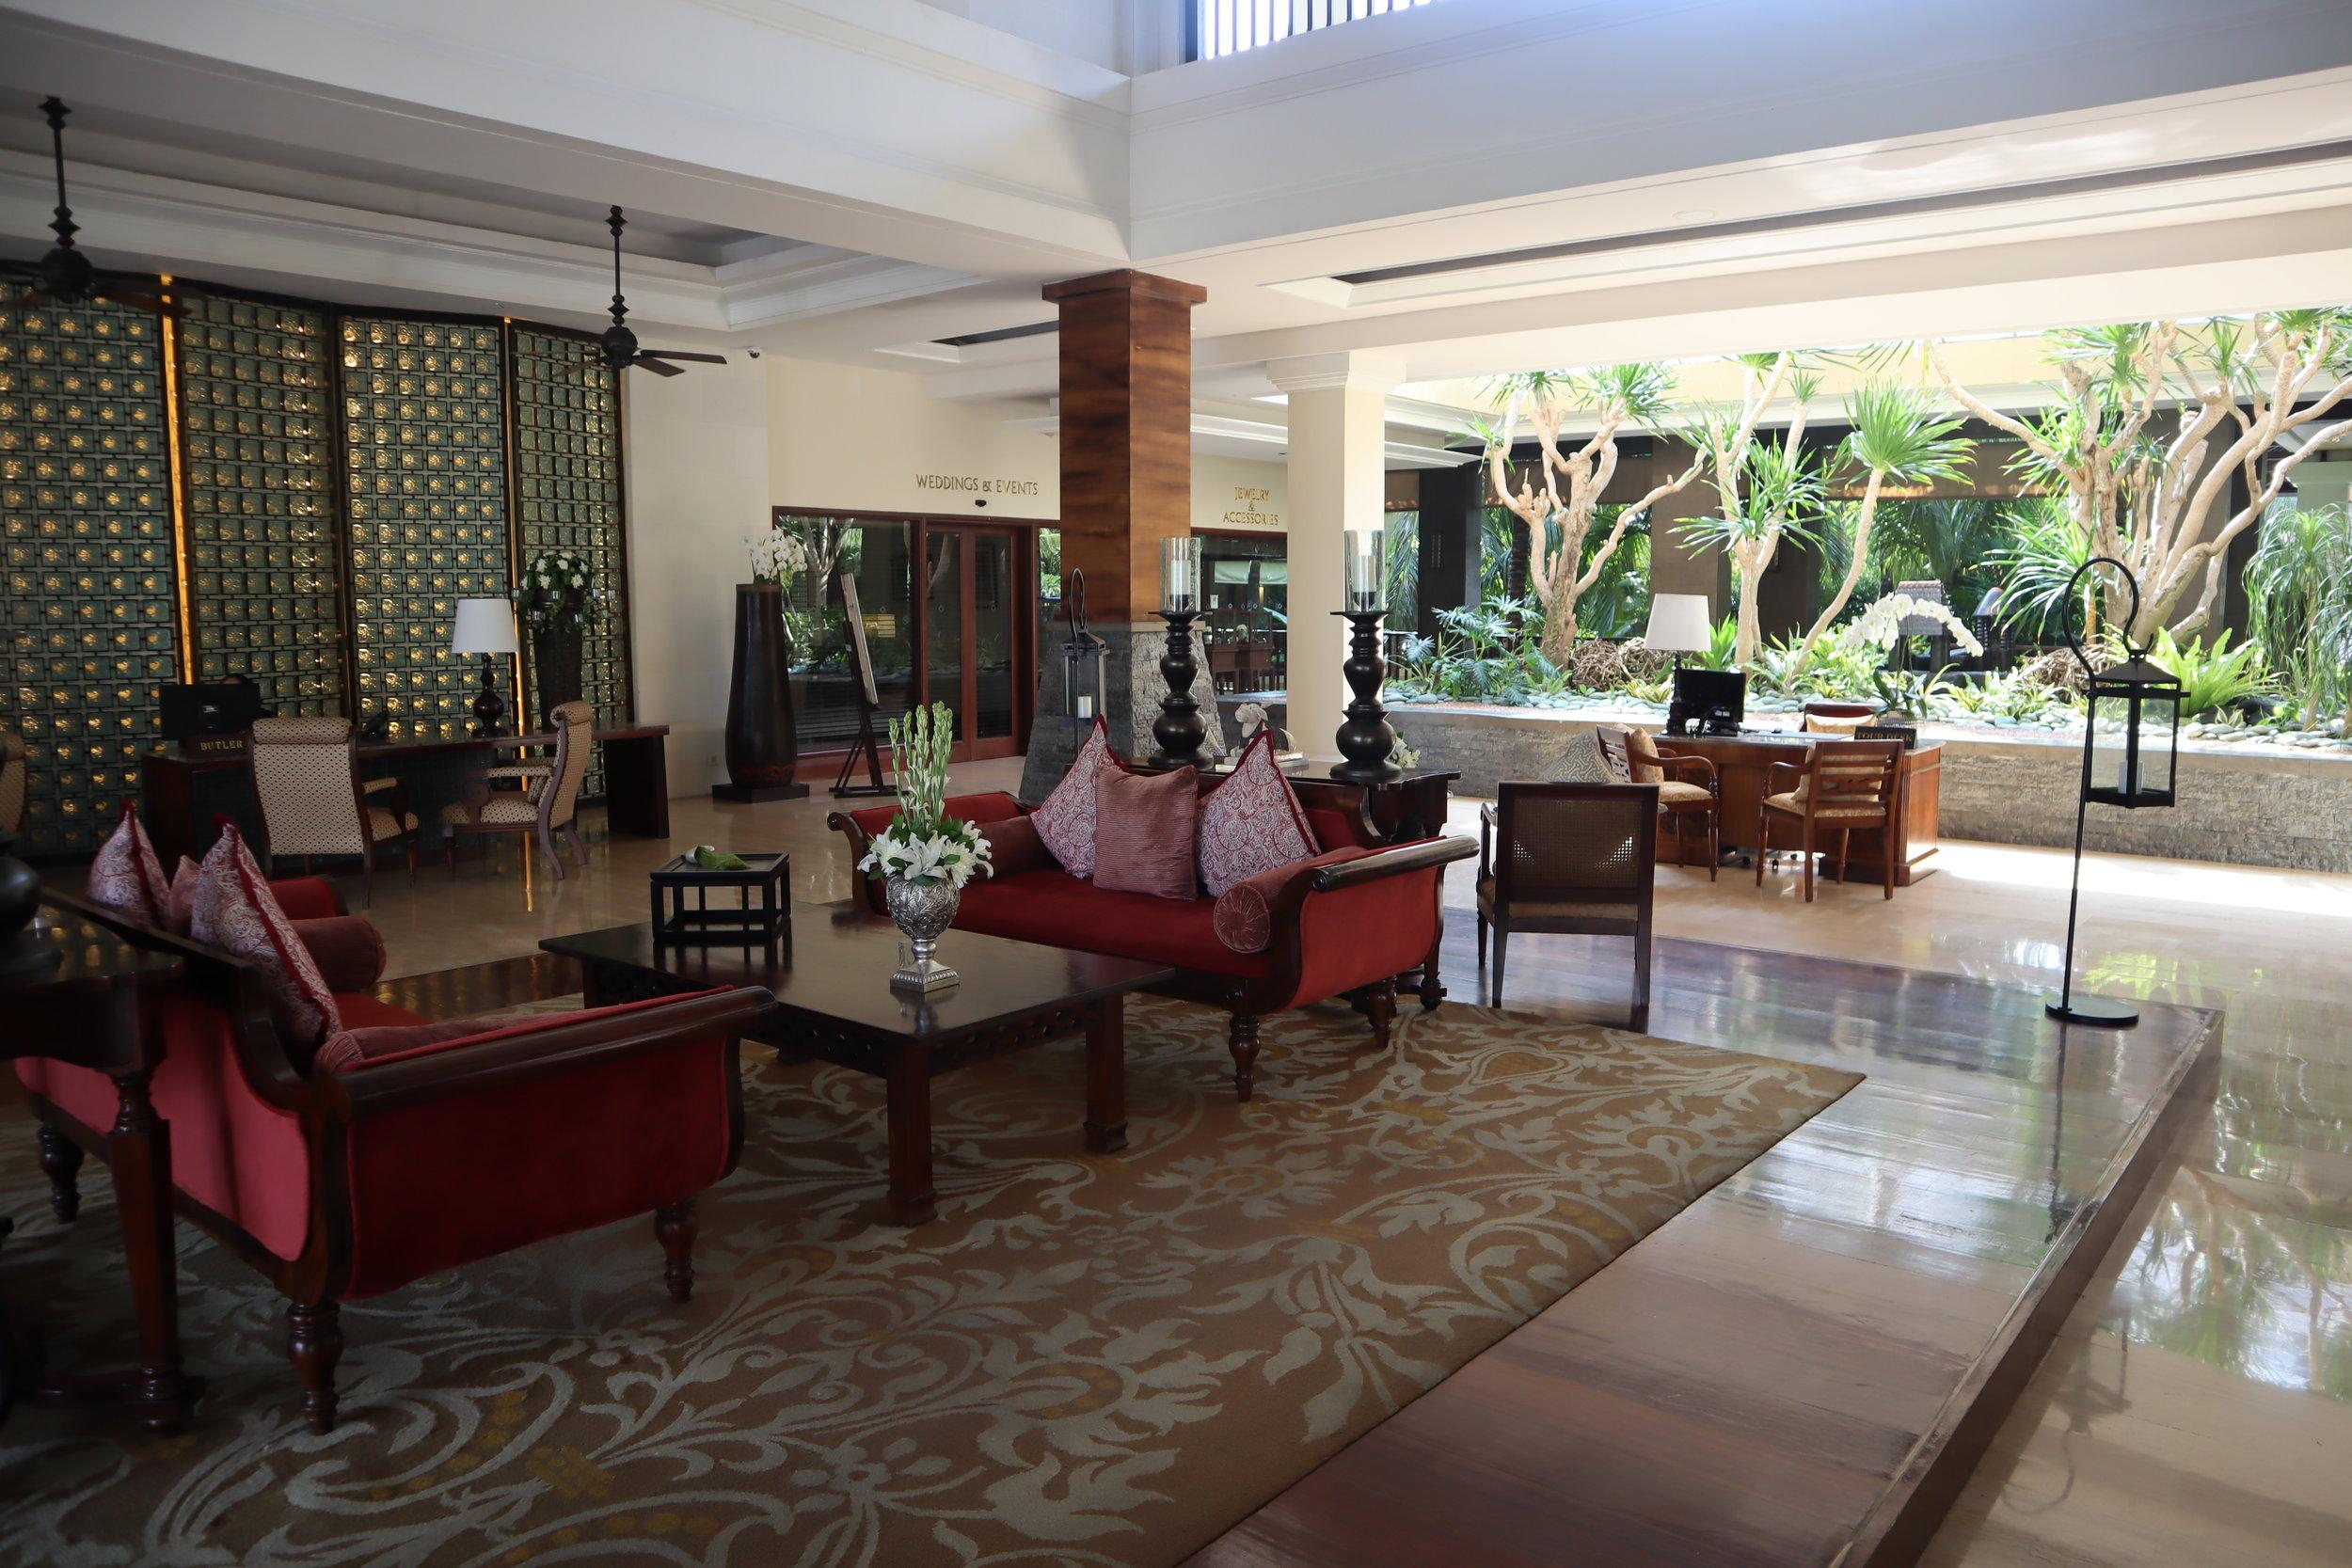 St. Regis Bali – Lobby seating area